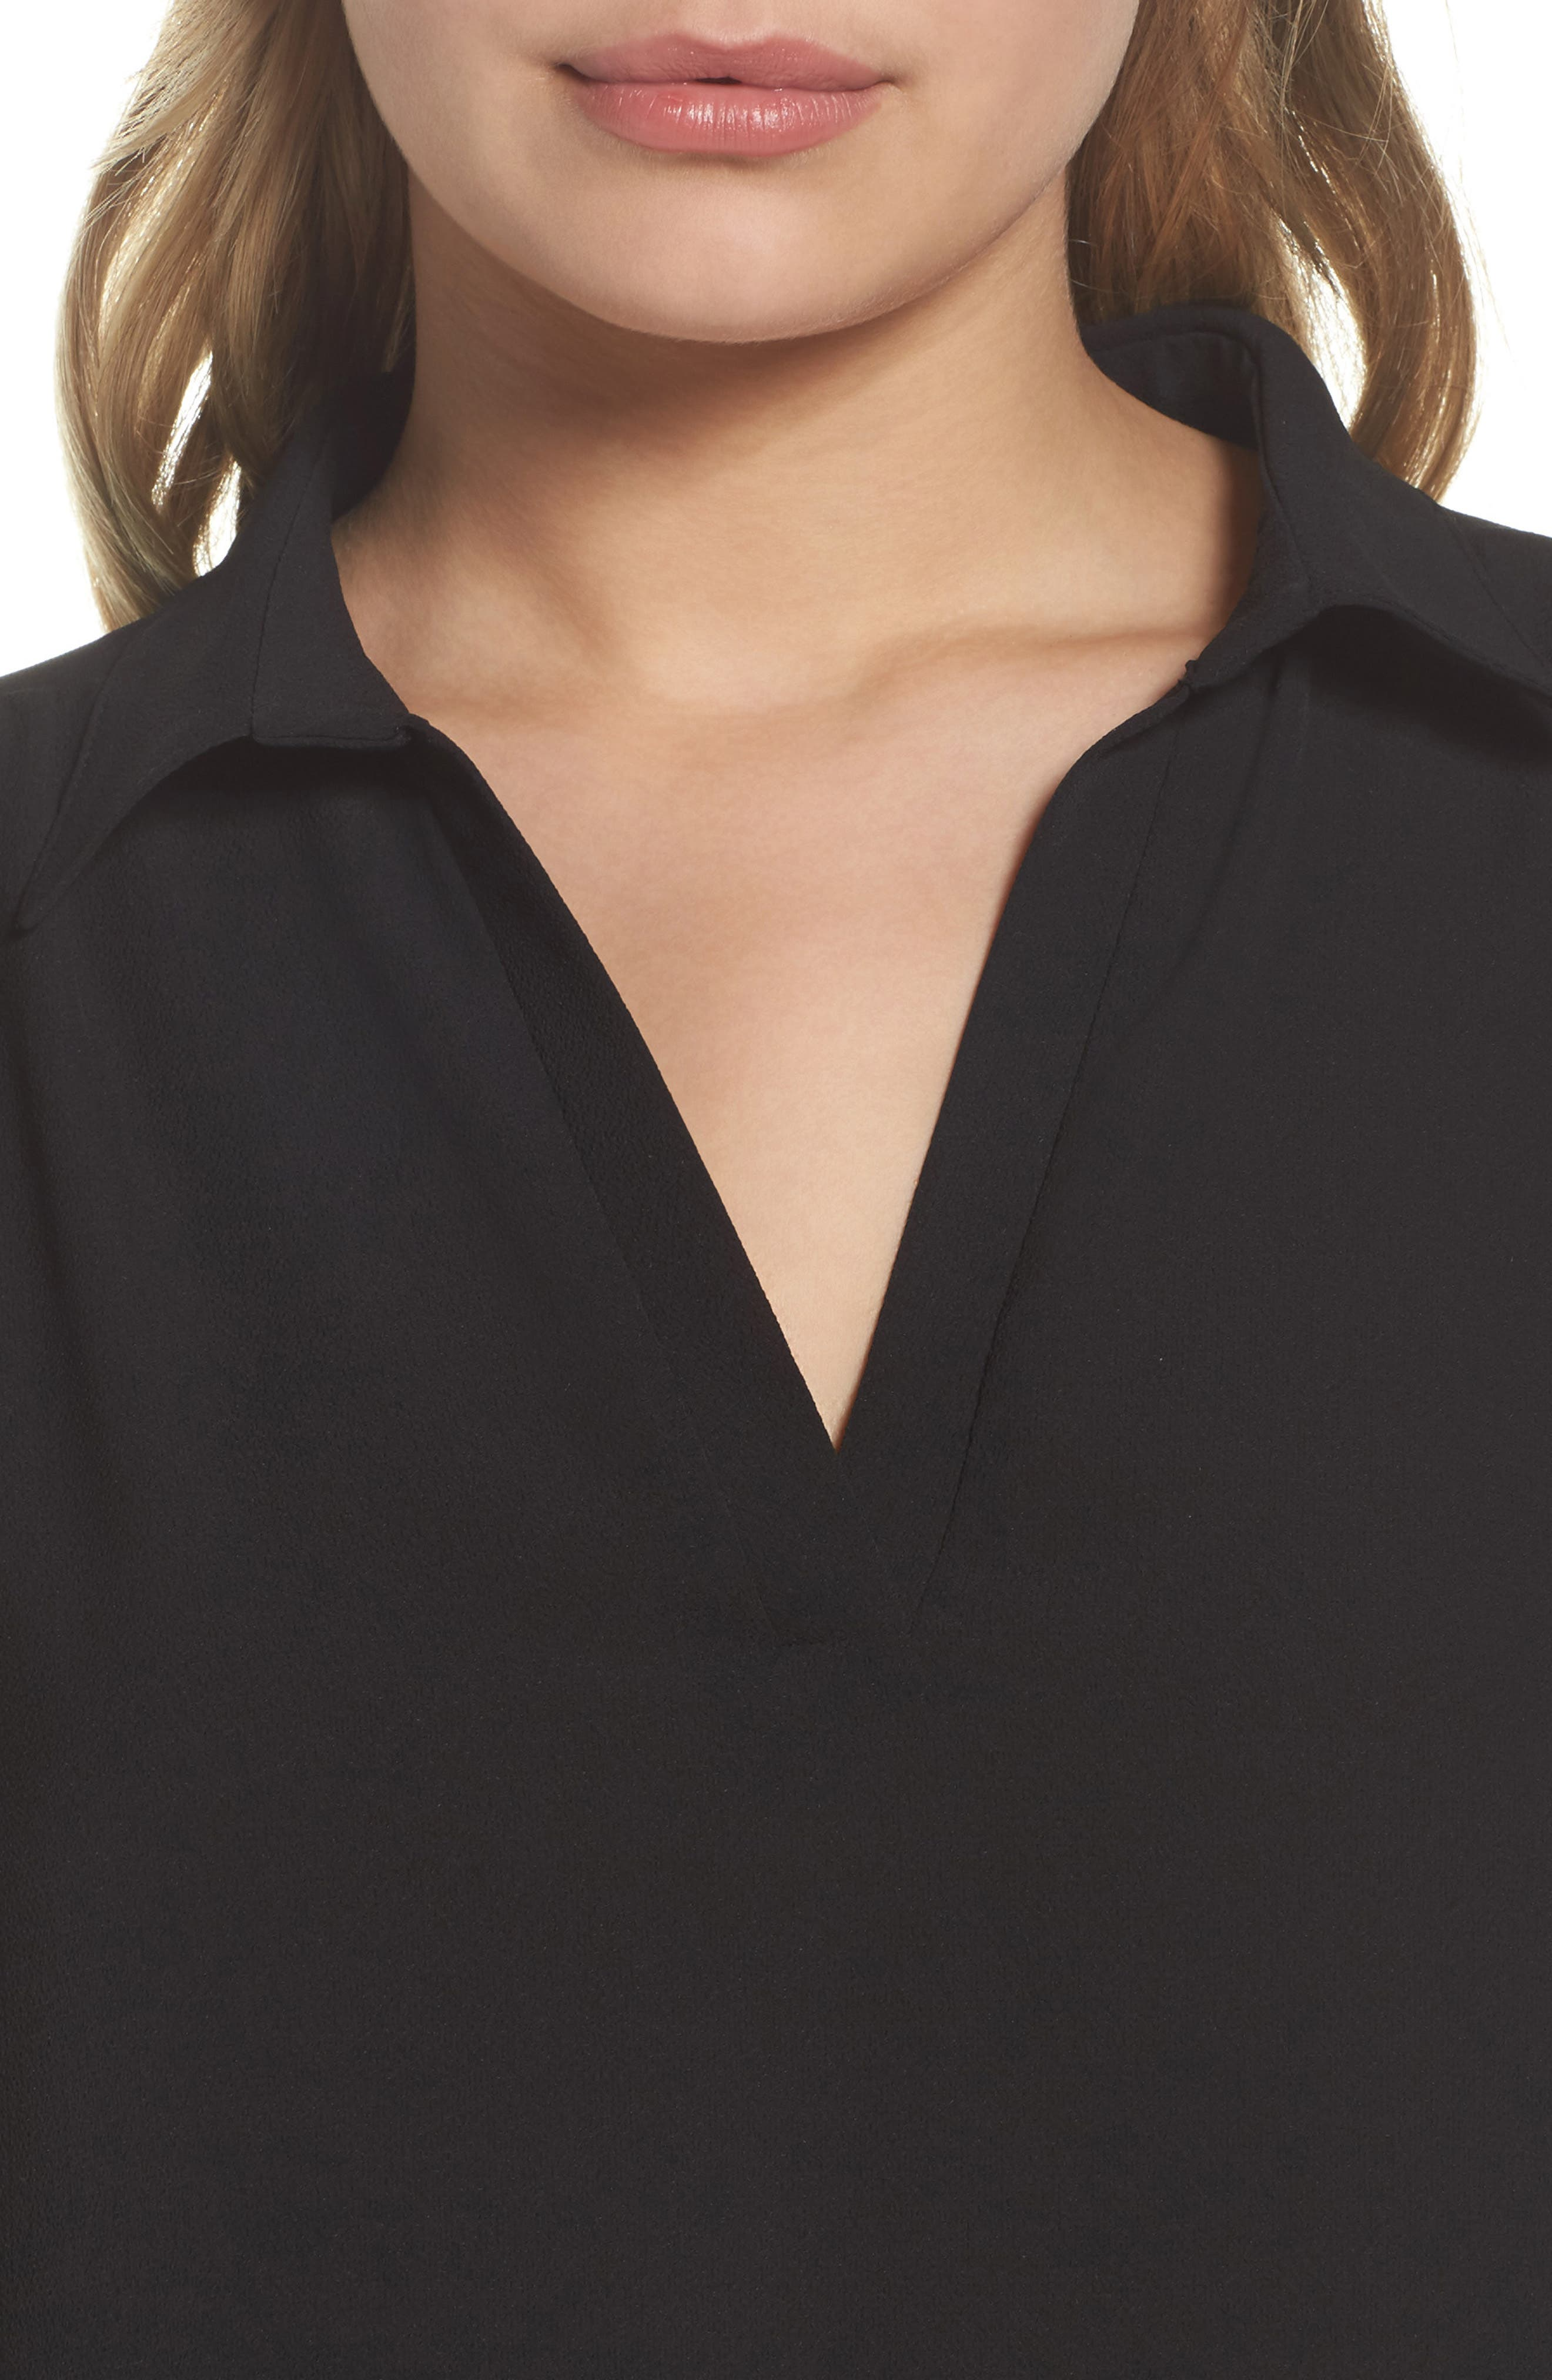 Shirtdress,                             Alternate thumbnail 4, color,                             Black